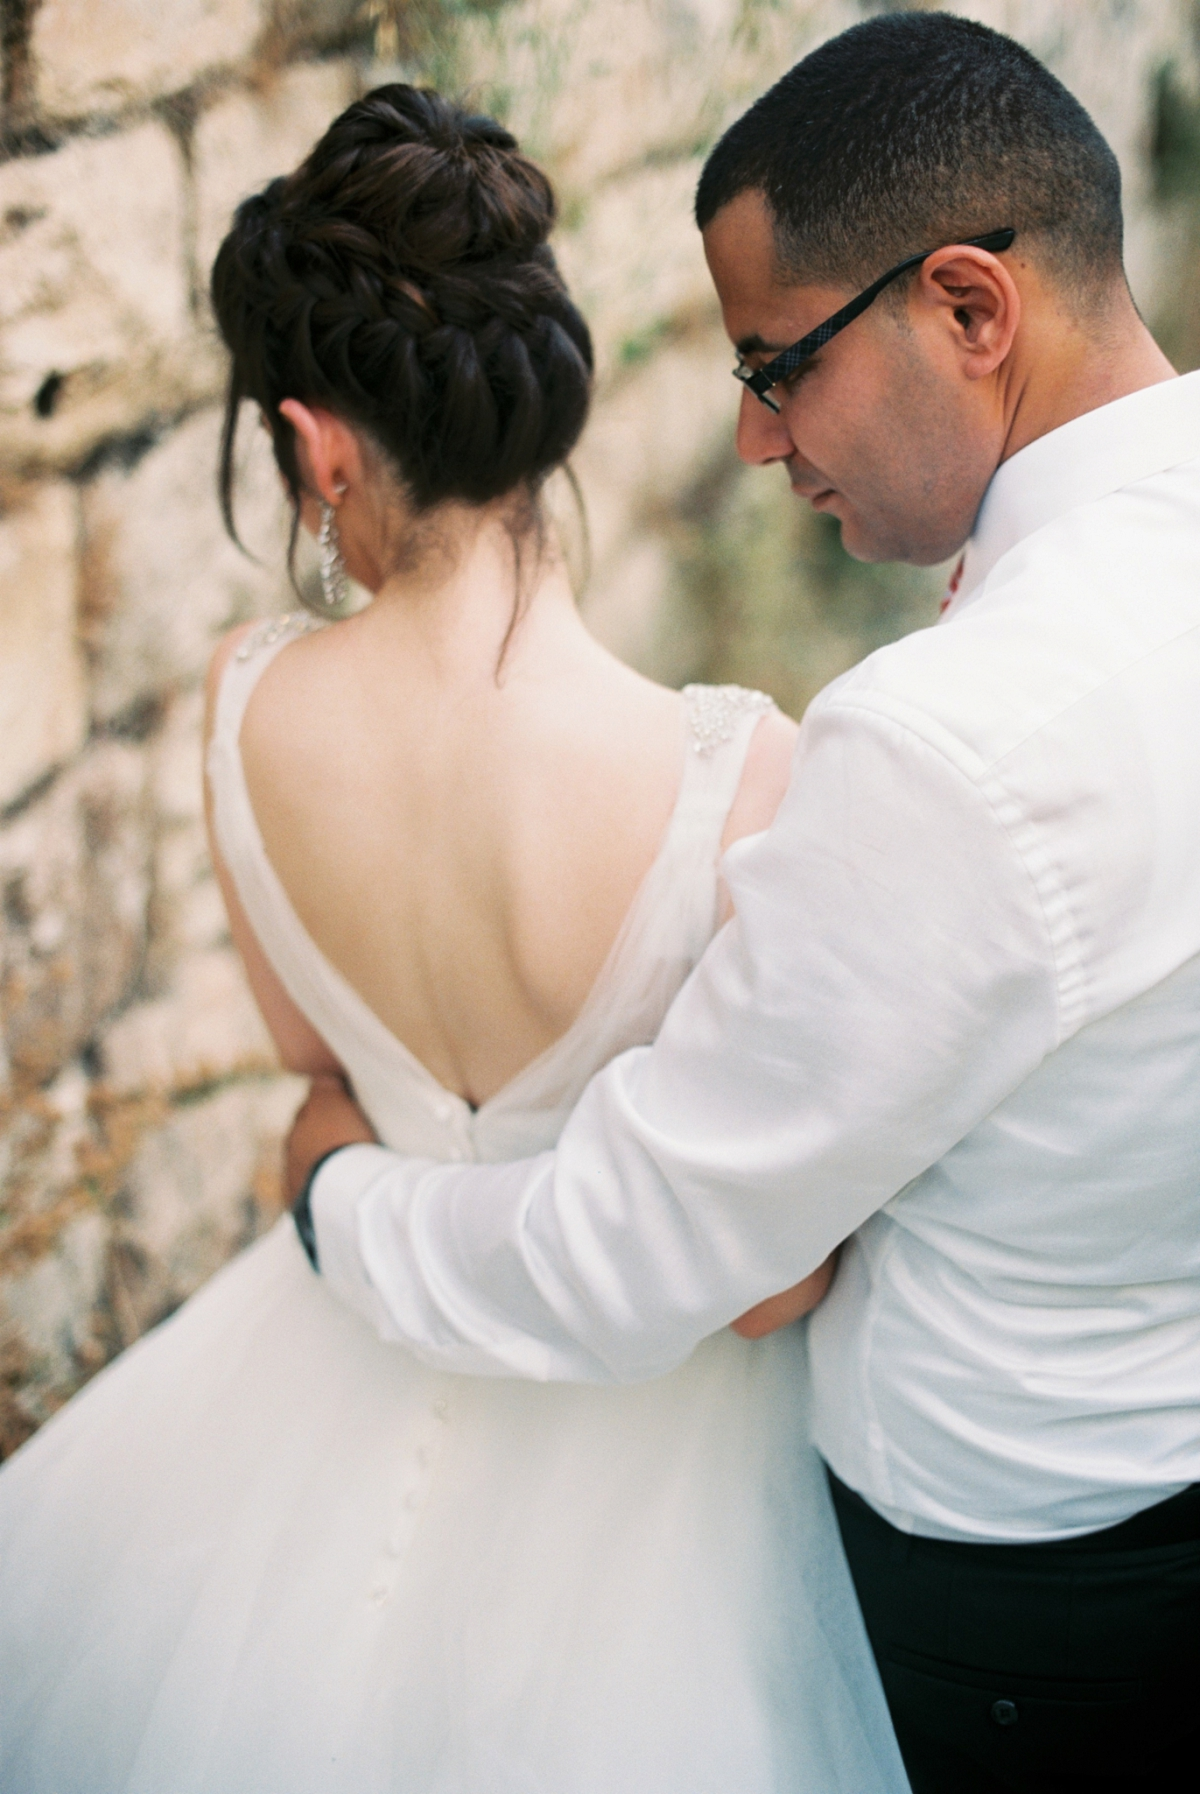 Lifta Bridal Portraits - Jerusalem Israel - Muna and Ali - Sigala Photography_0007